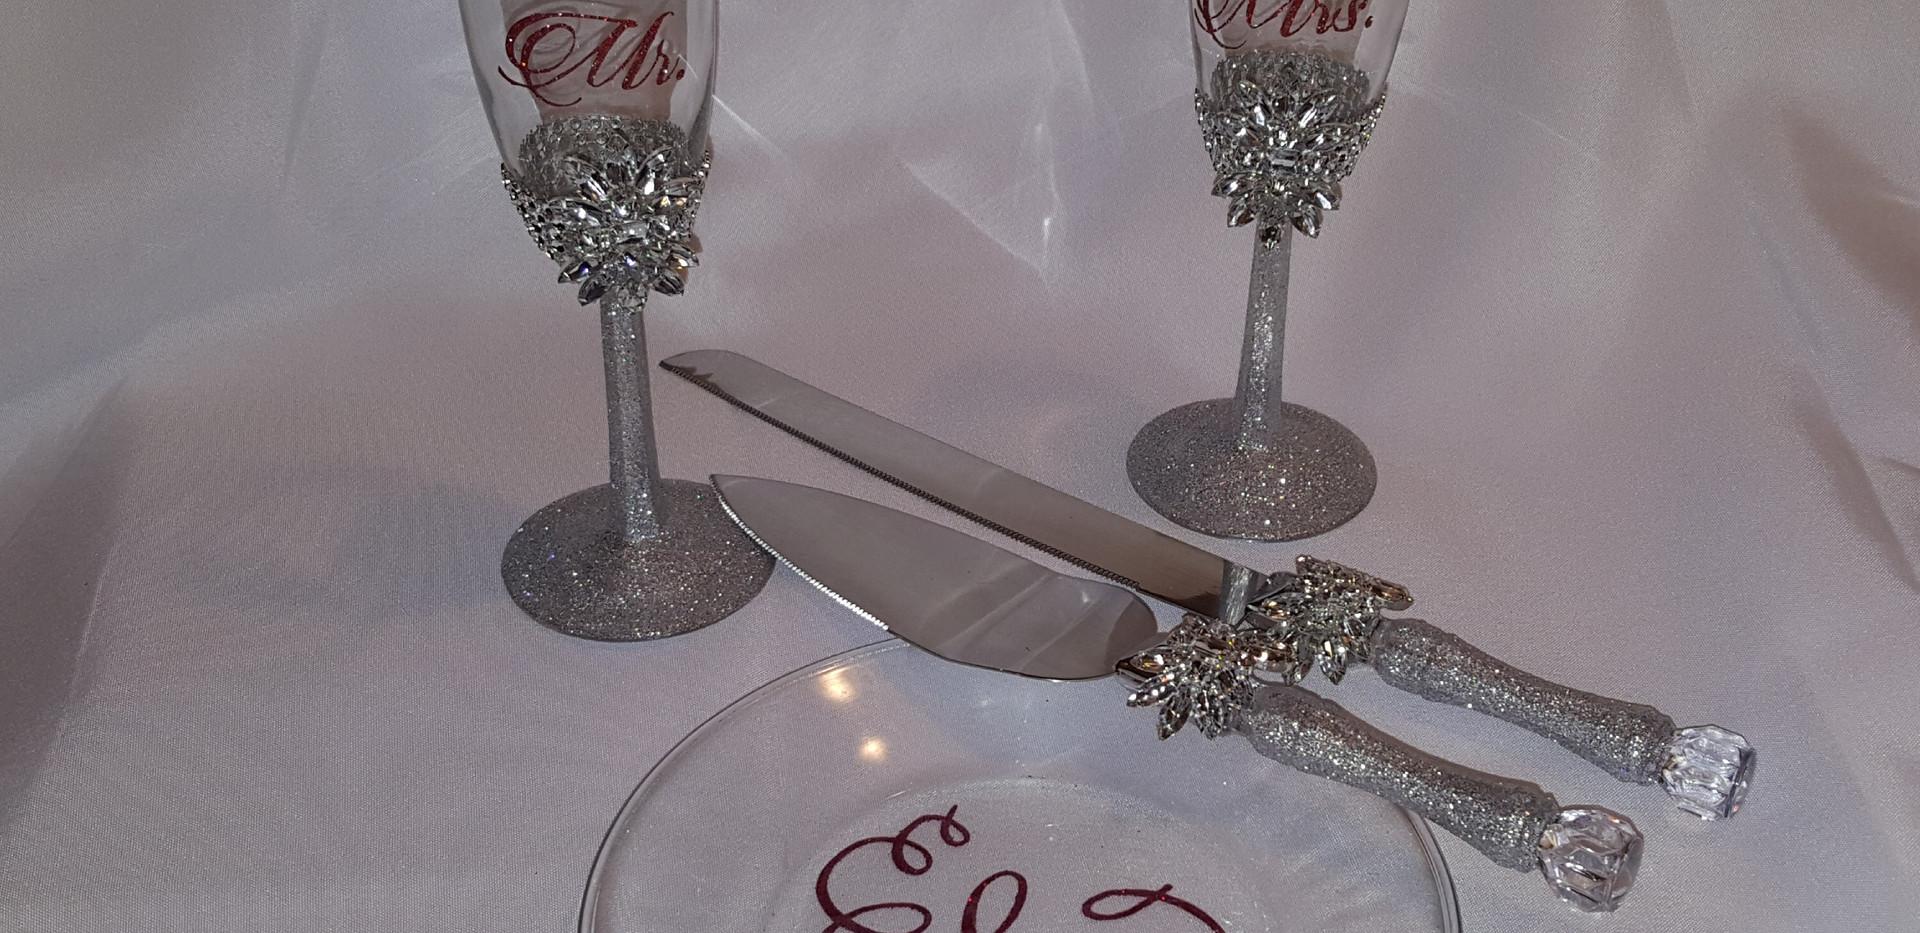 Toasting glasses and Cake Set